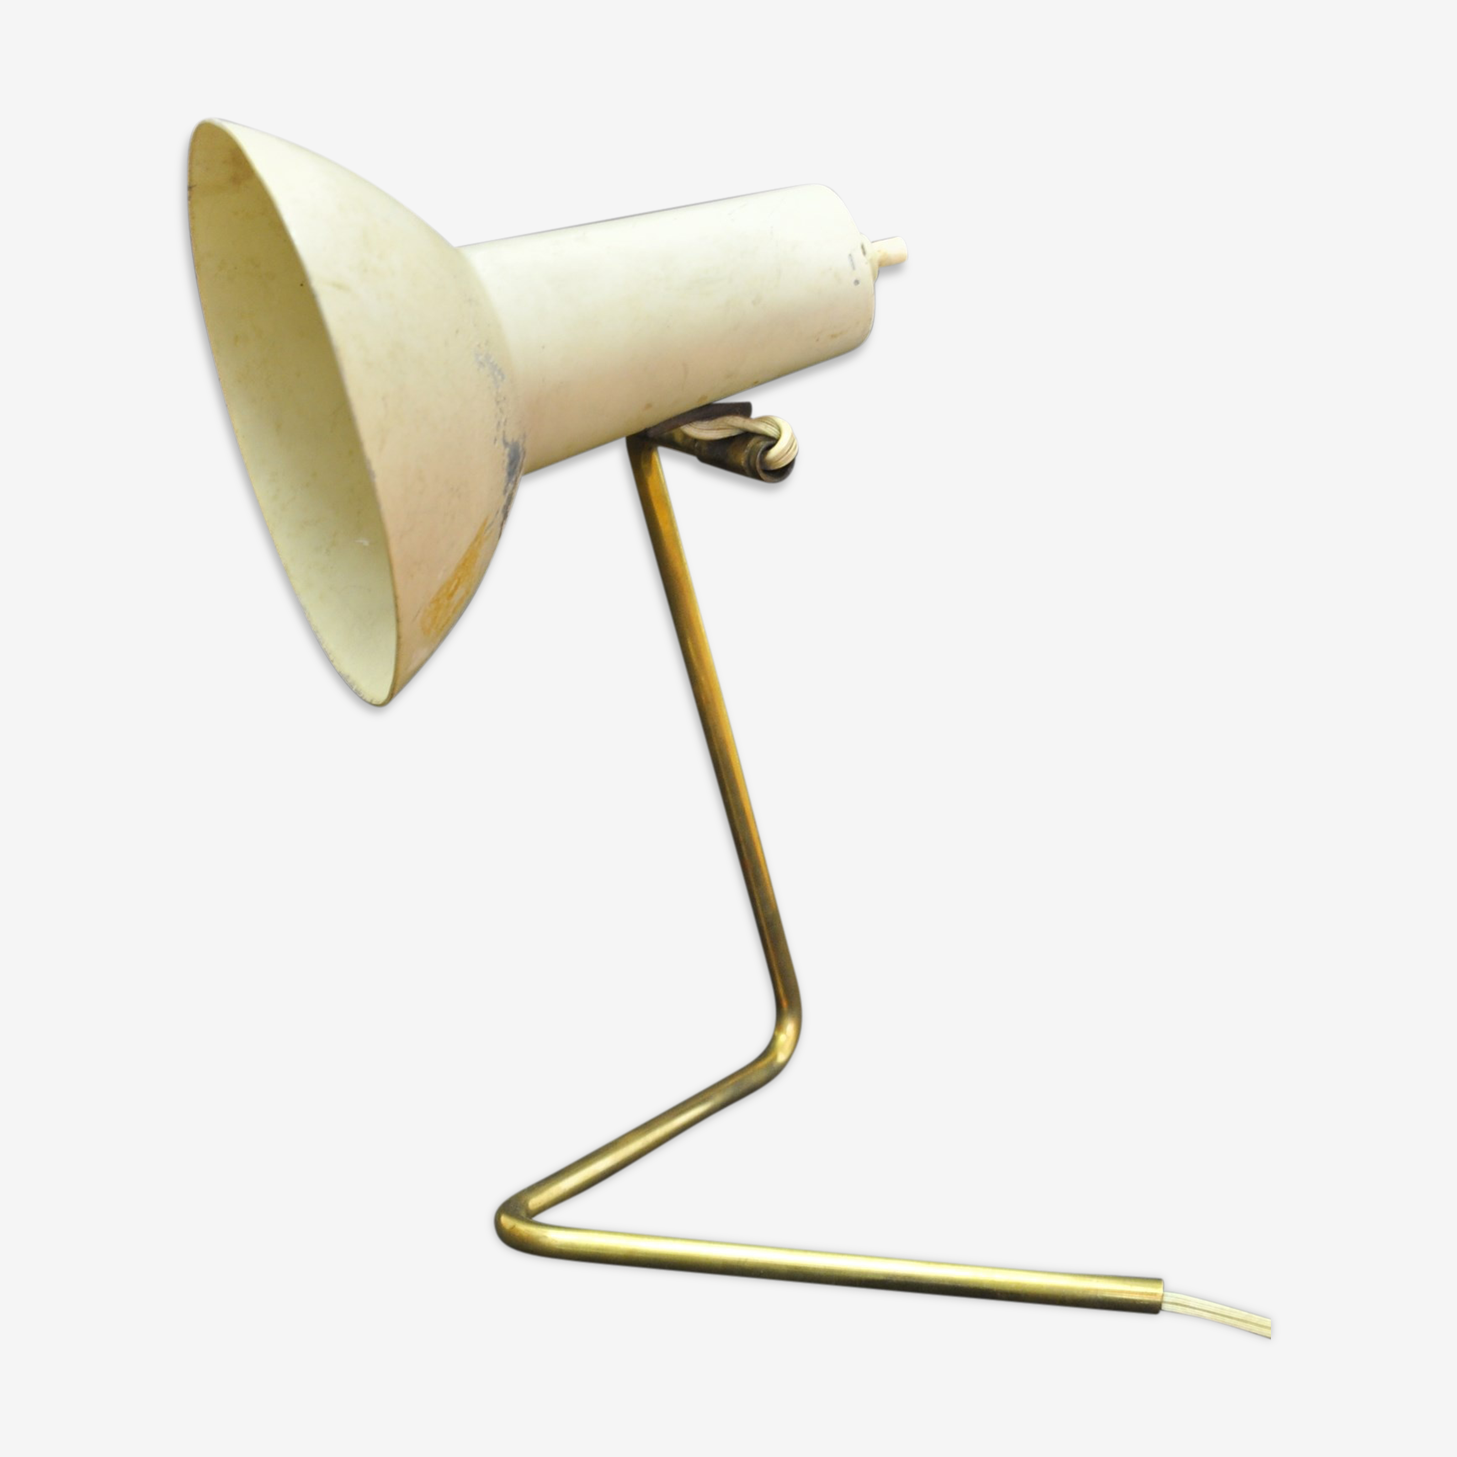 Lampe Arteluce mod. 551 par Gino Sarfatti